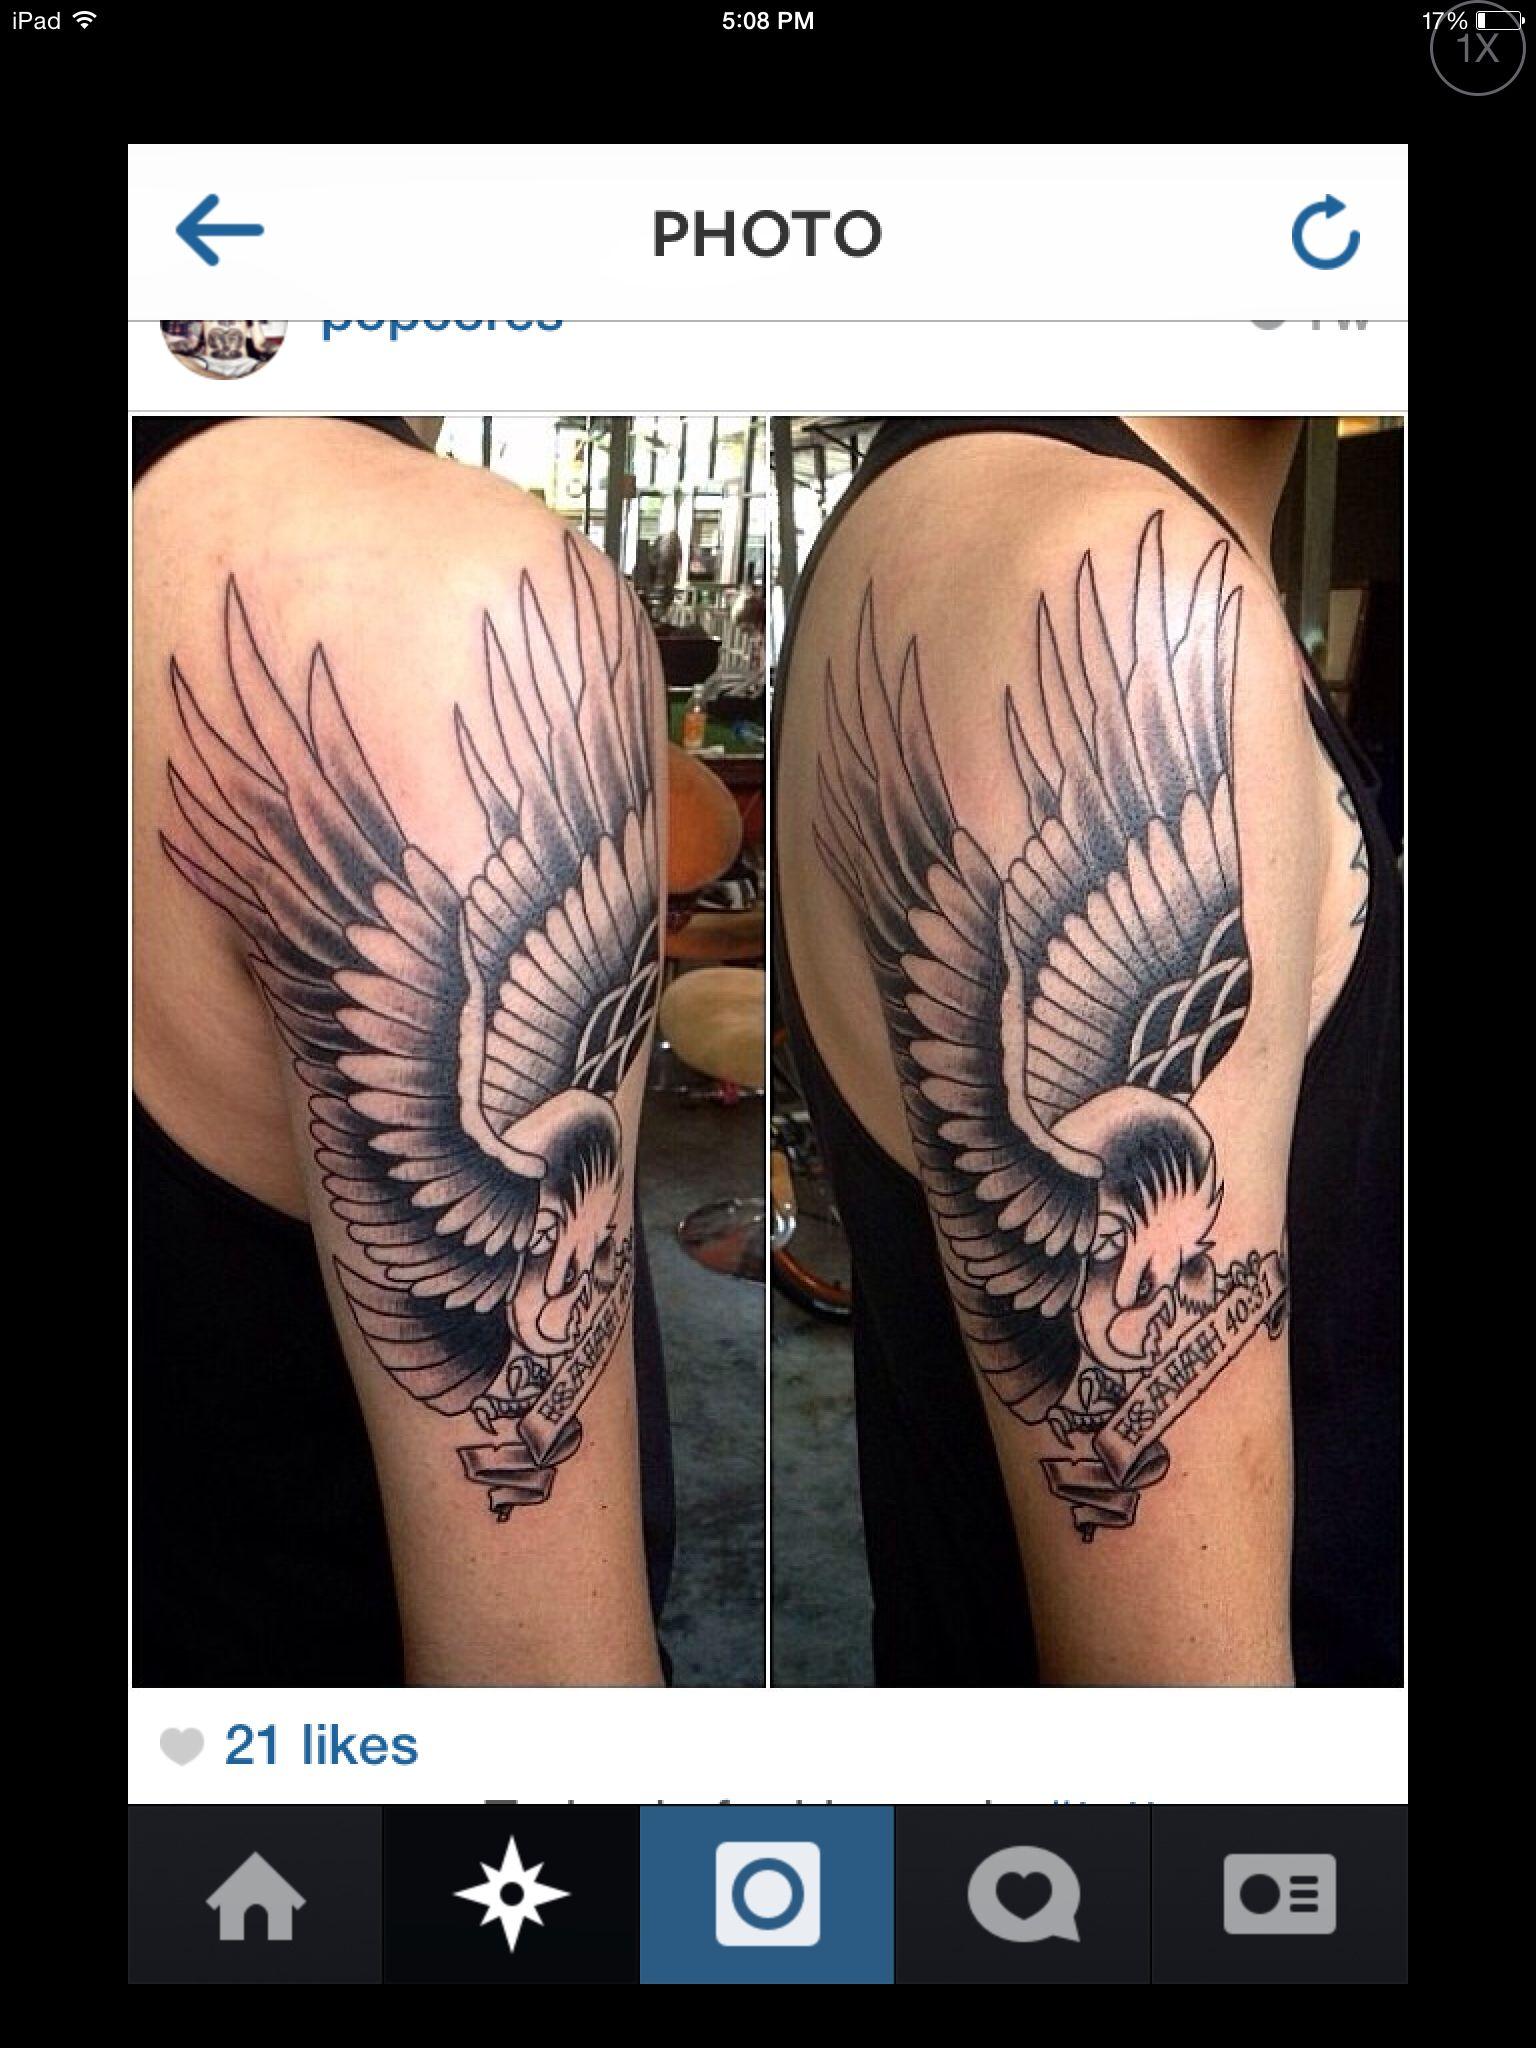 Isaiah 40:31 Tattoo : isaiah, 40:31, tattoo, Eagle, Tattoo, Isaiah, Tattoos,